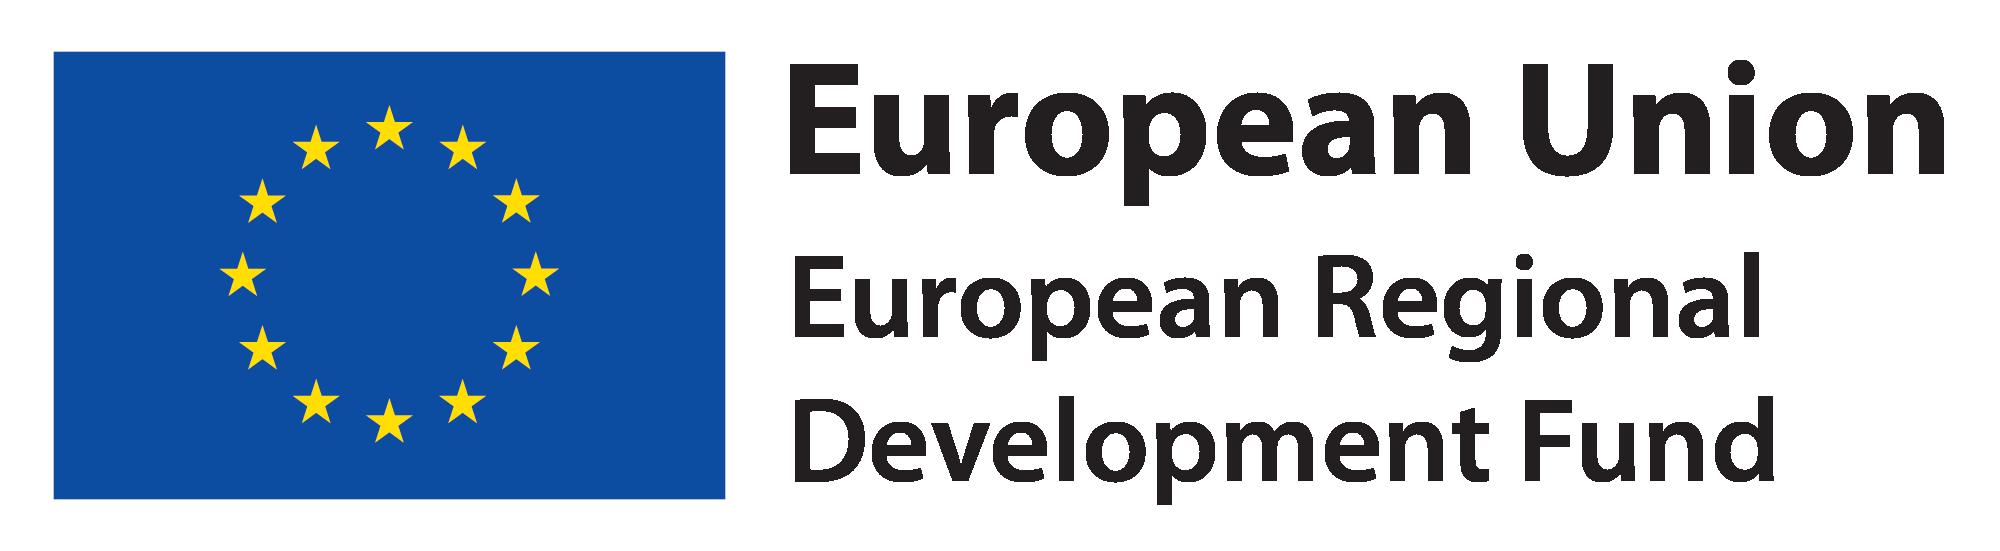 http___www.southernassembly.ie_images_uploads_EU-ERDF-EN-2000px.png